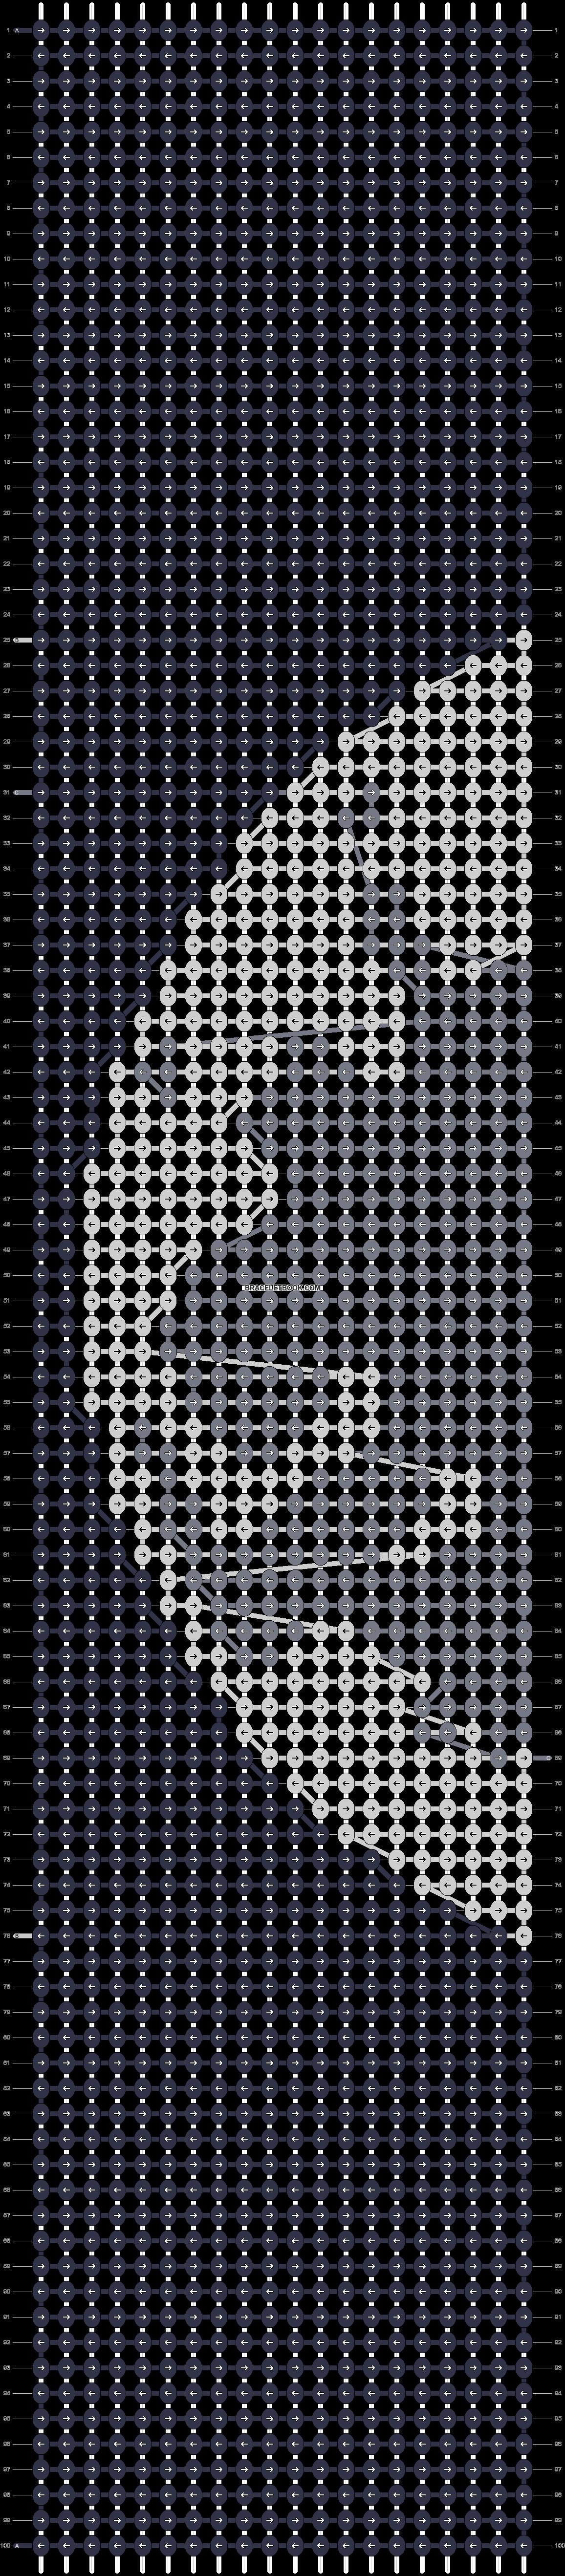 Alpha Pattern #22465 added by kbhend9715